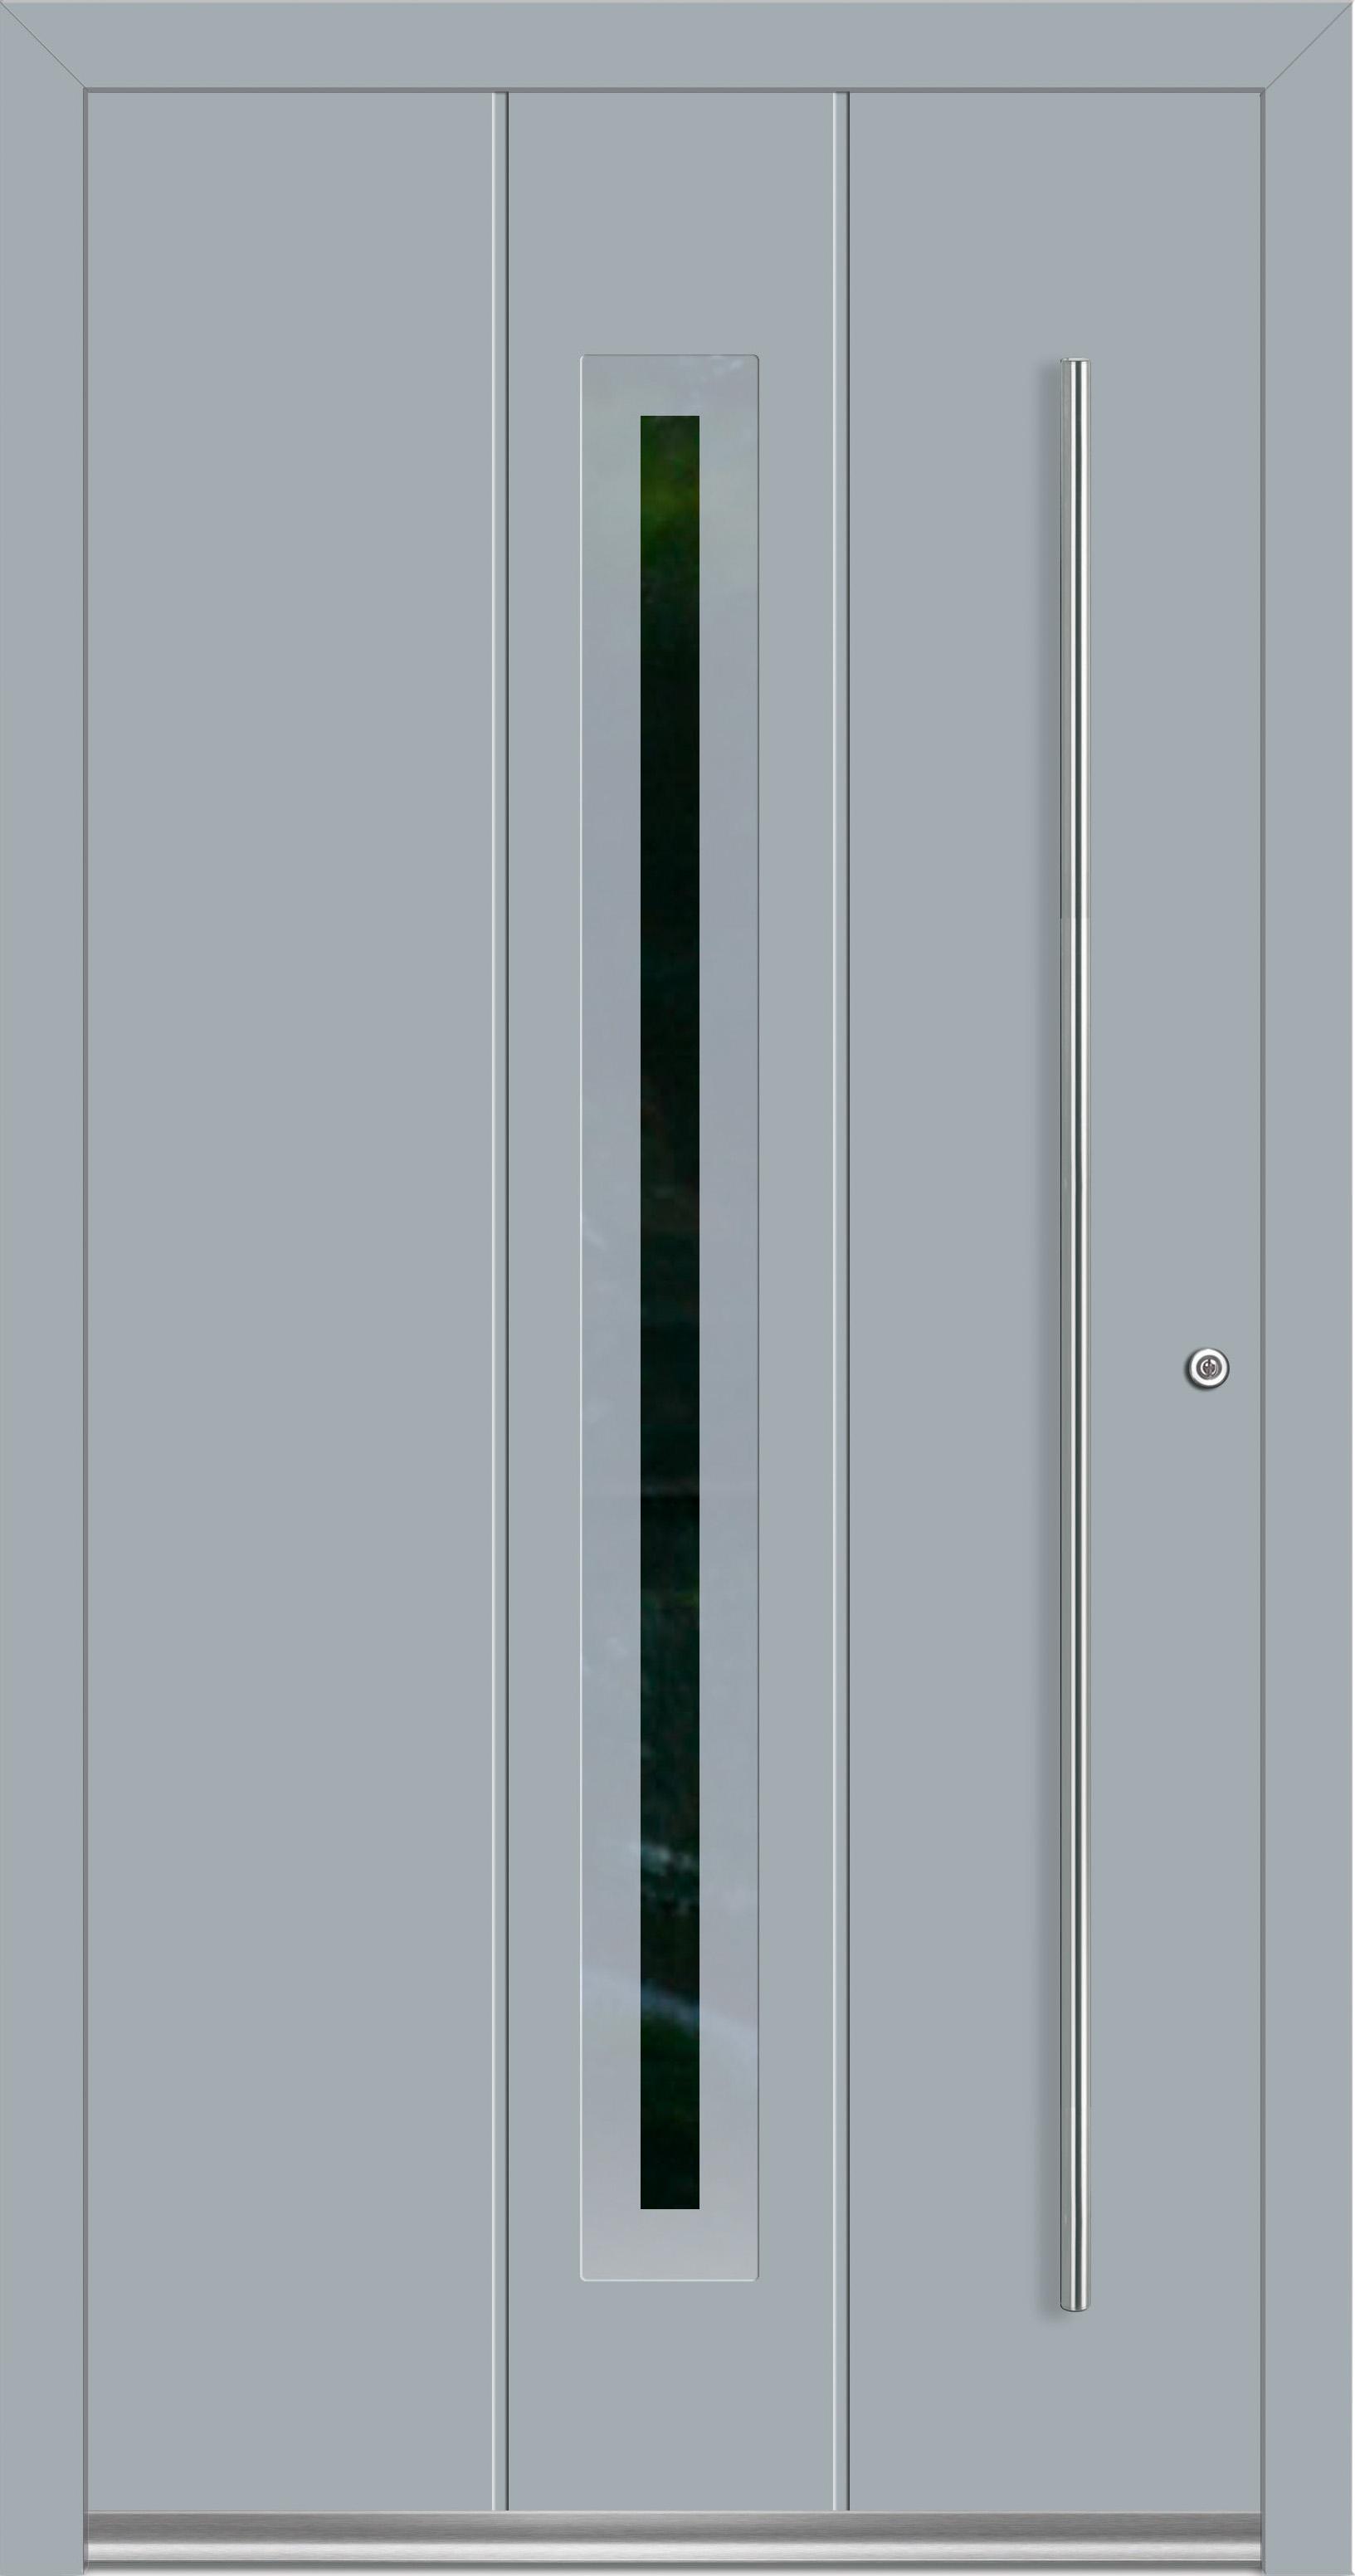 Rocket 5 Aluminium Haustur Mit Glasausschnitt